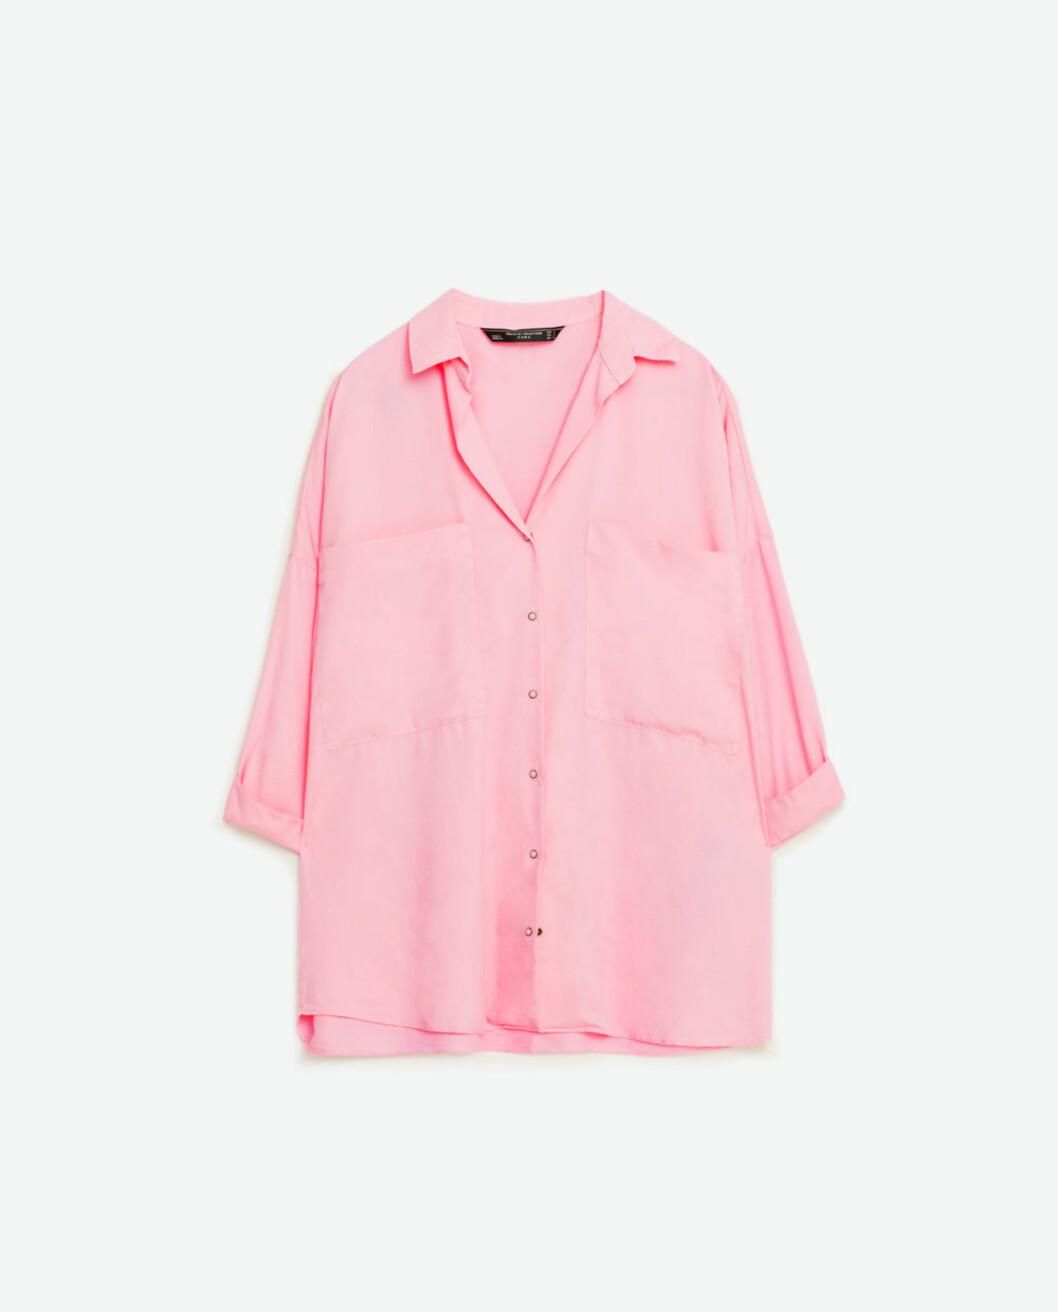 Skjorte fra Zara | kr 299 | http://www.zara.com/no/no/trf/skjorter/oversize-skjorte-c269211p3773872.html